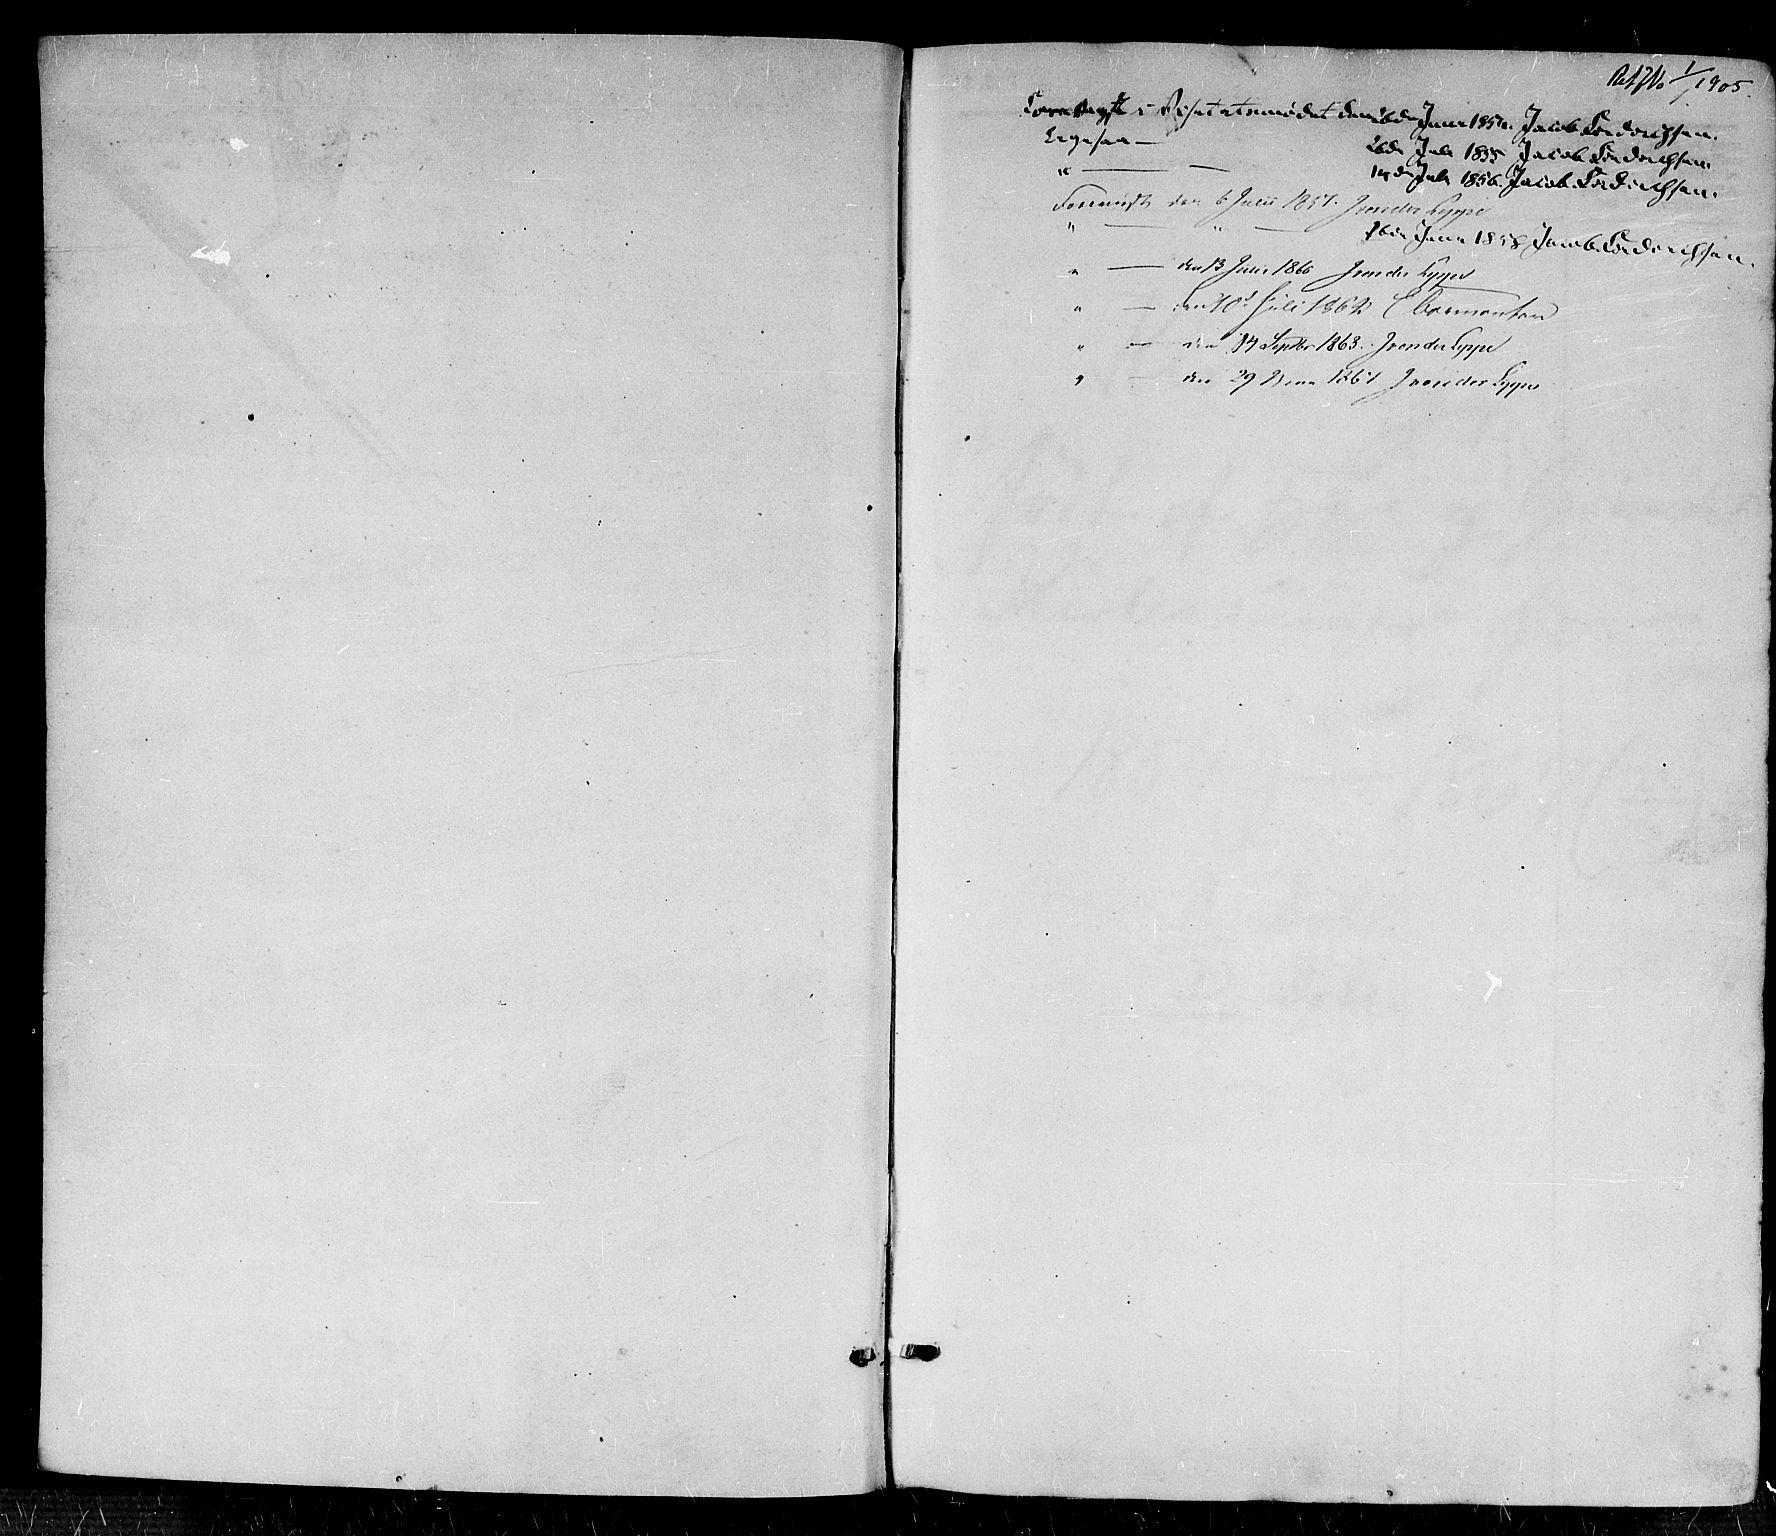 SAK, Fjære sokneprestkontor, F/Fb/L0008: Klokkerbok nr. B 8, 1854-1867